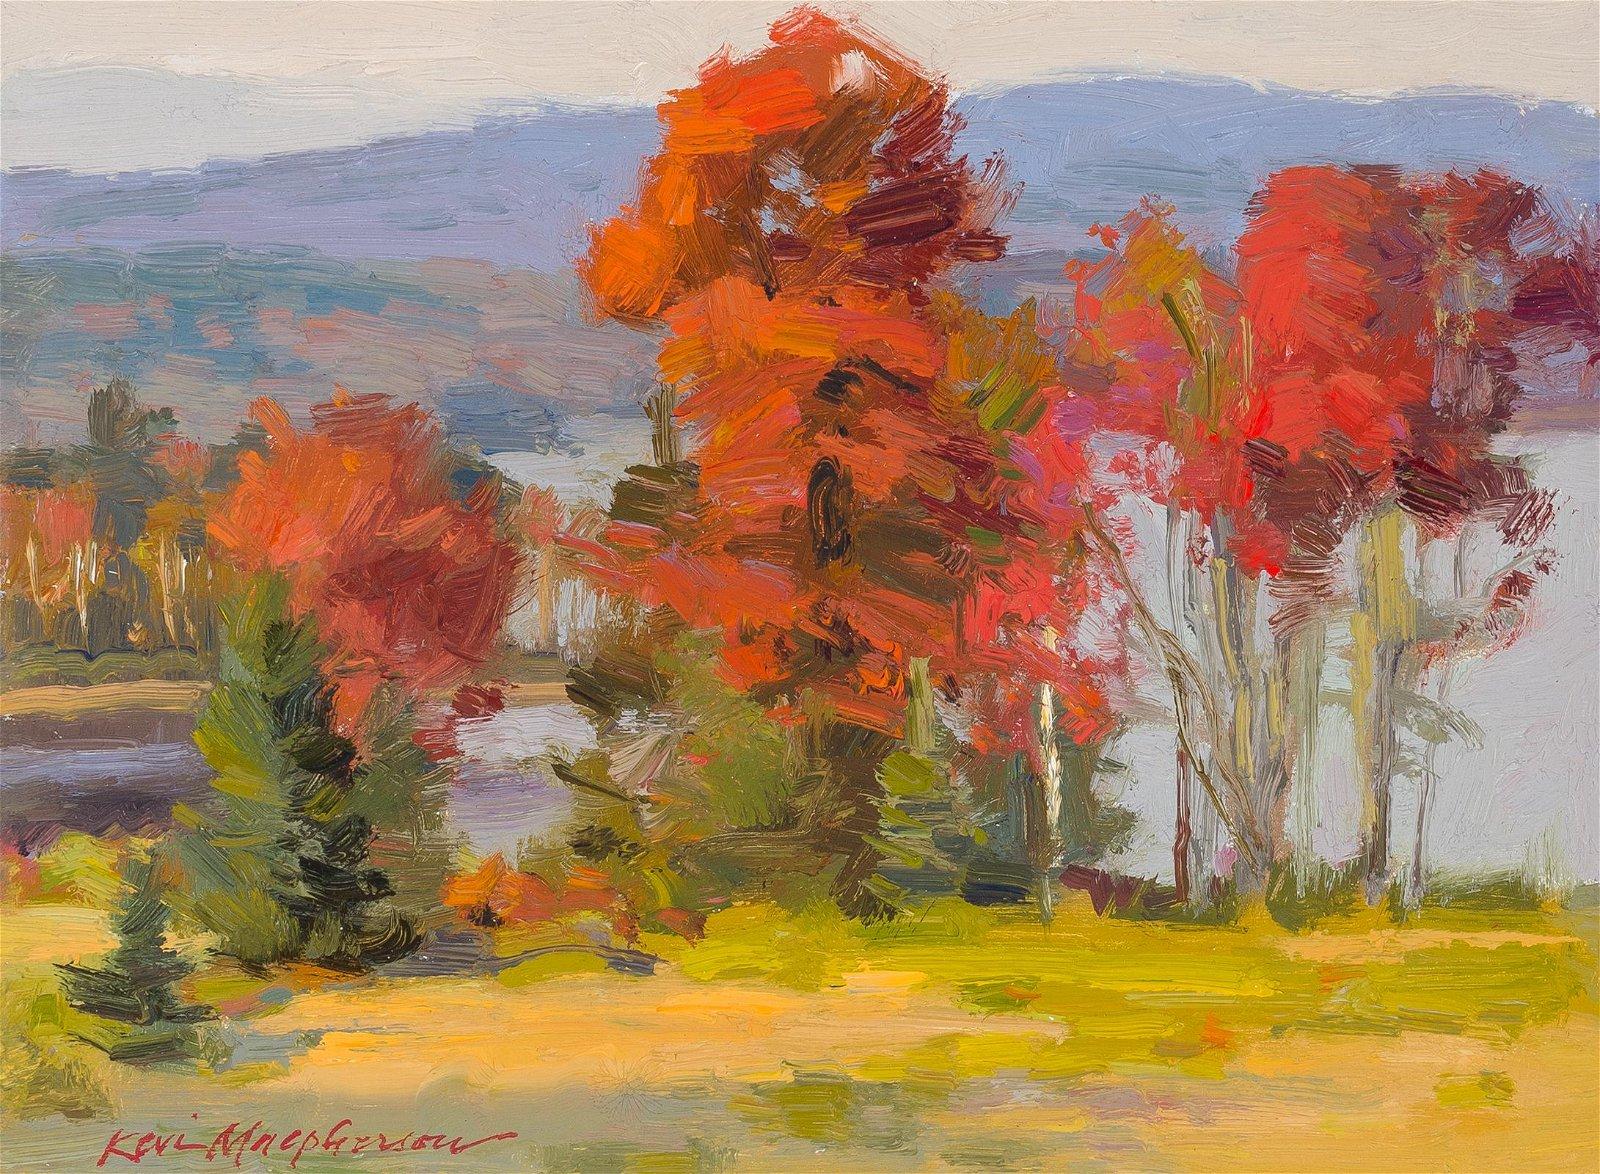 Kevin Macpherson | Autumn Serenade